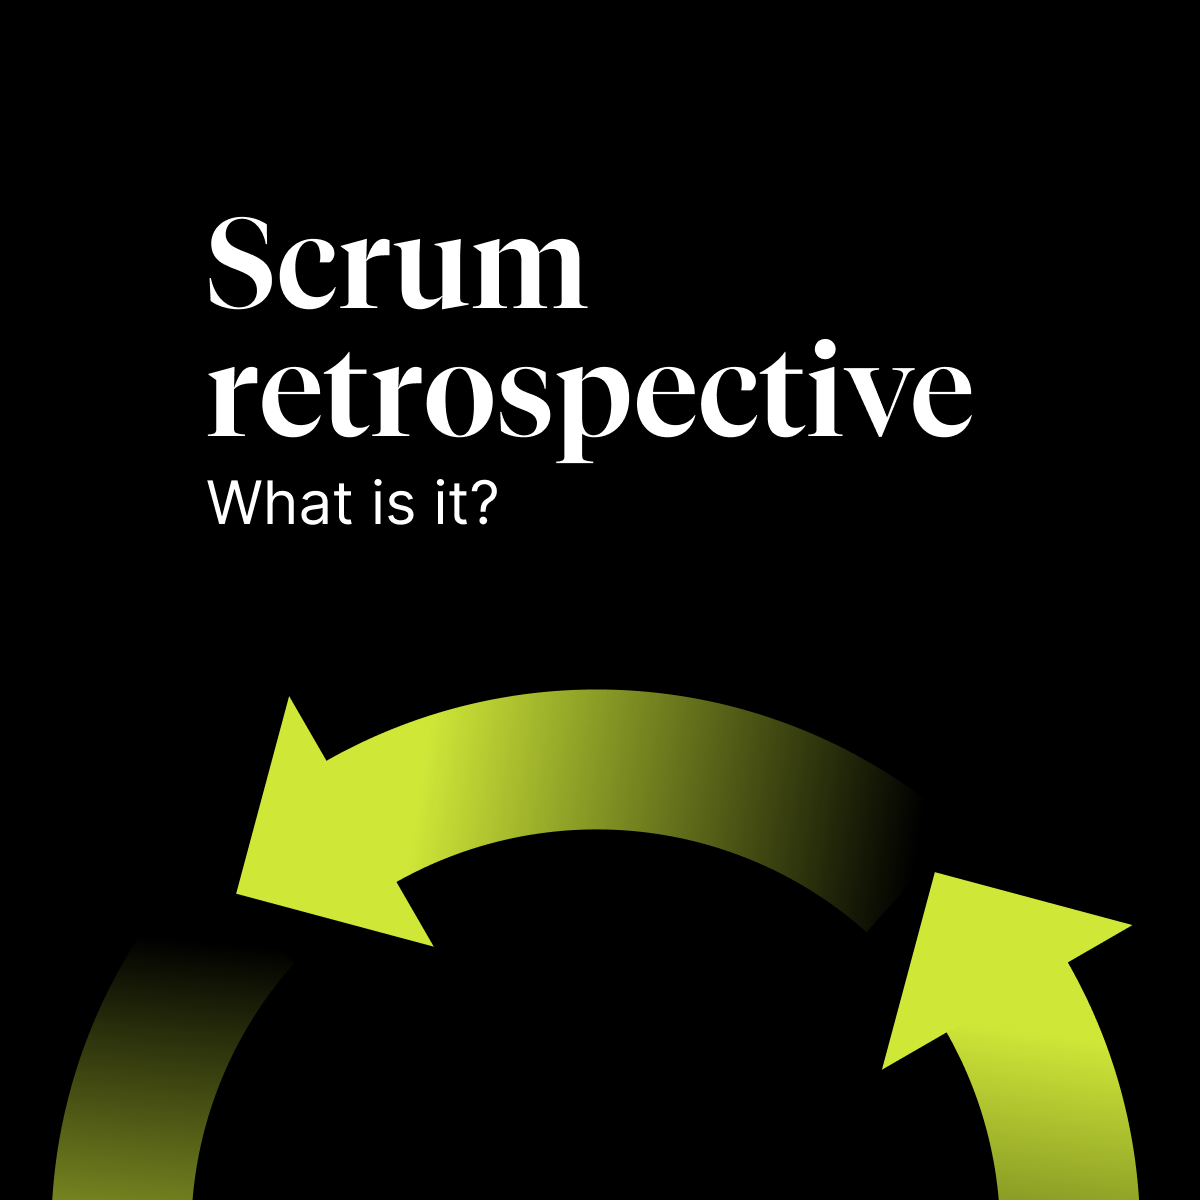 Scrum retrospective: What is it?